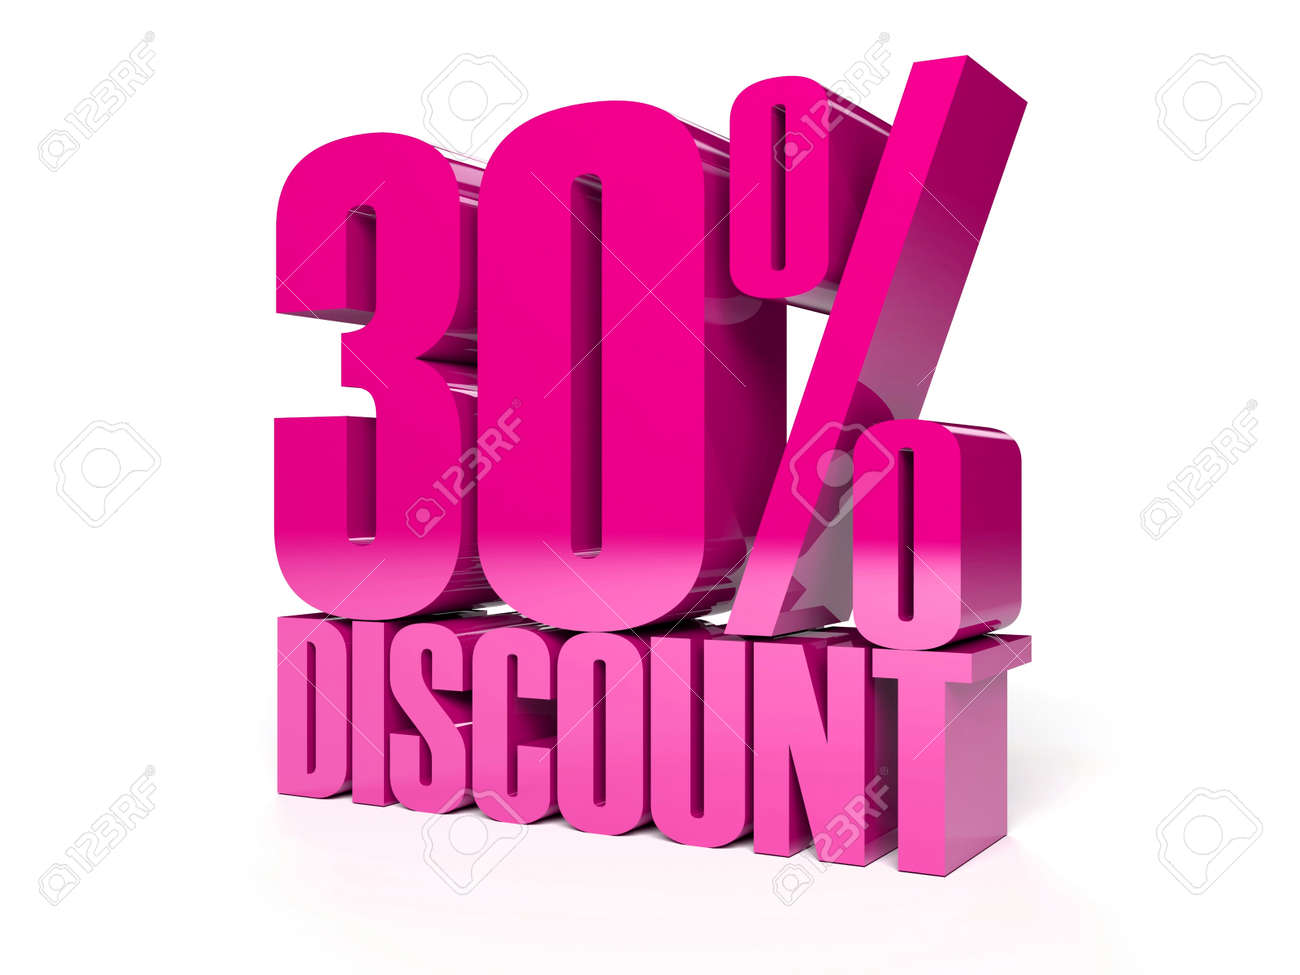 30 percent discount. Pink shiny text. Concept 3D illustration. Stock Illustration - 22491878